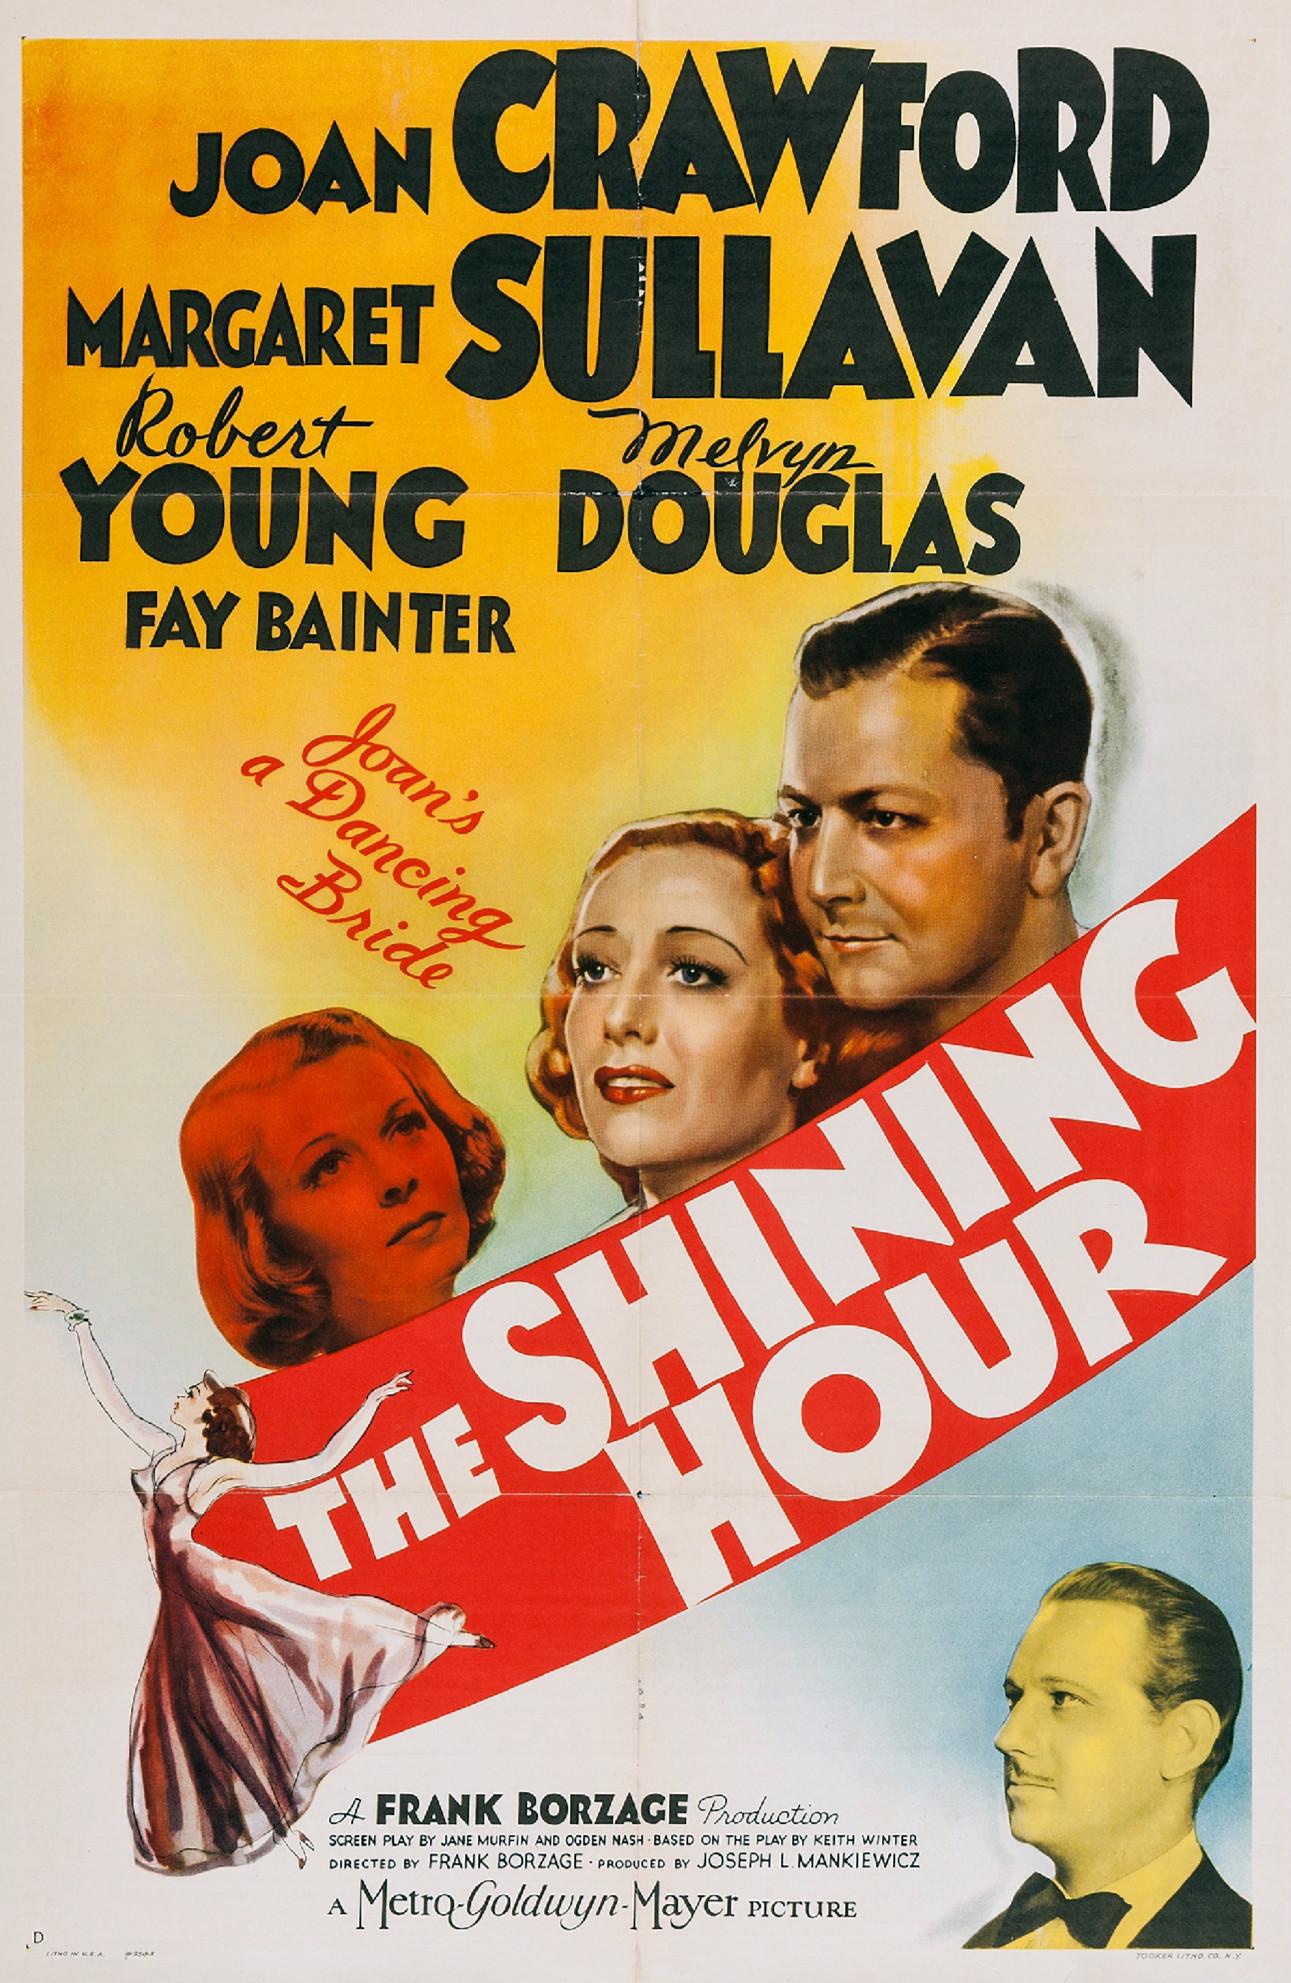 The Shining Hour - Wikipedia